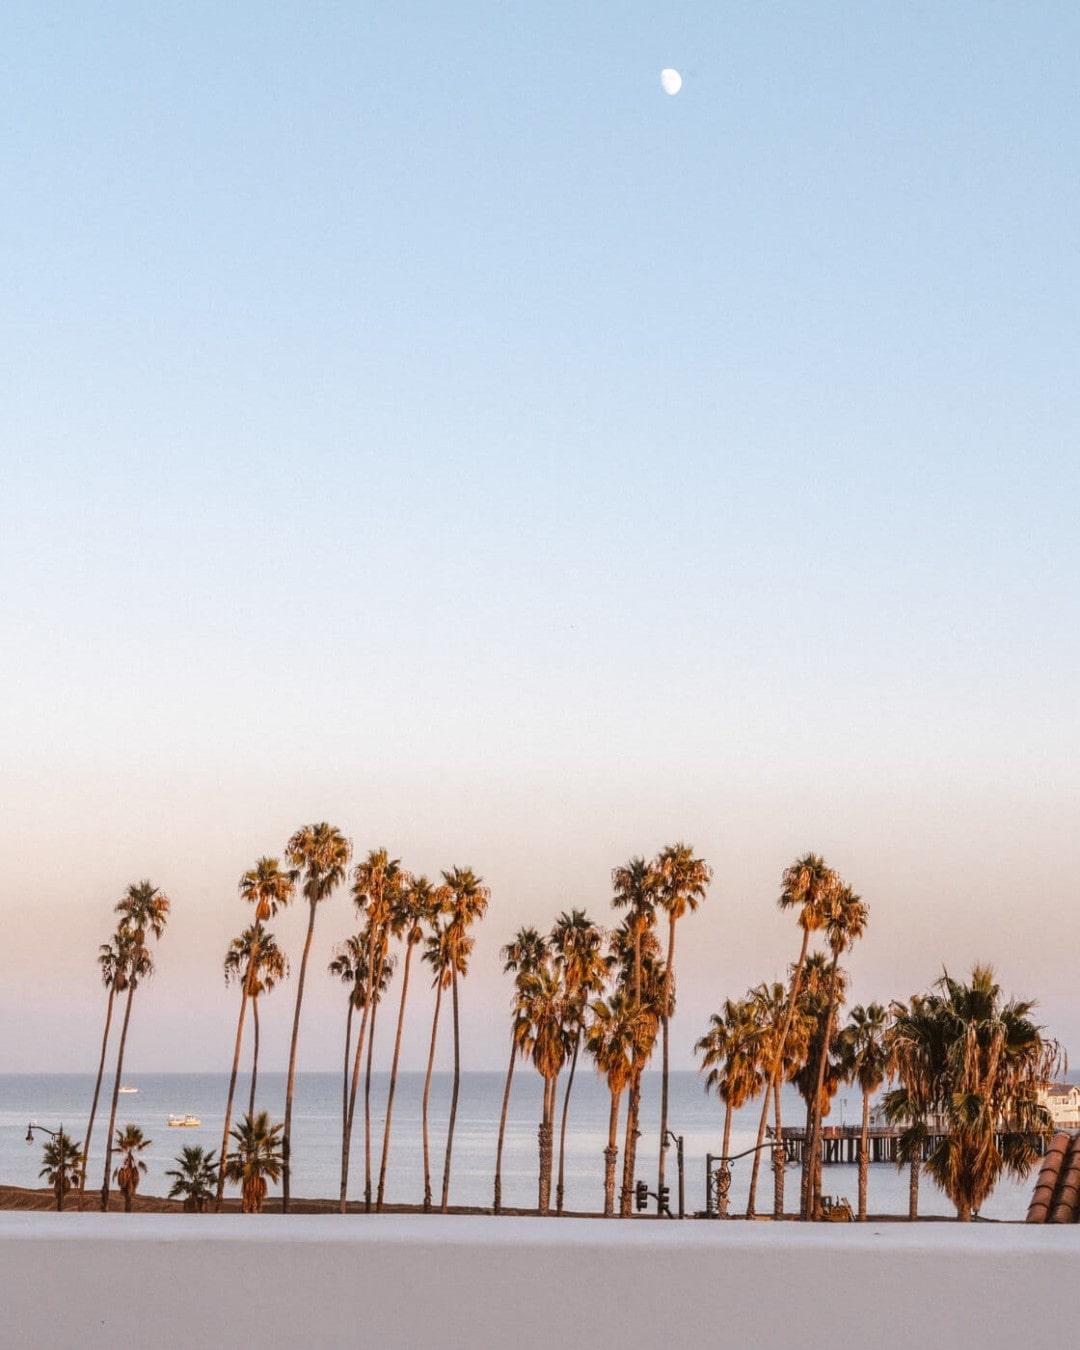 Palm trees lined up along the Santa Barbara coastline